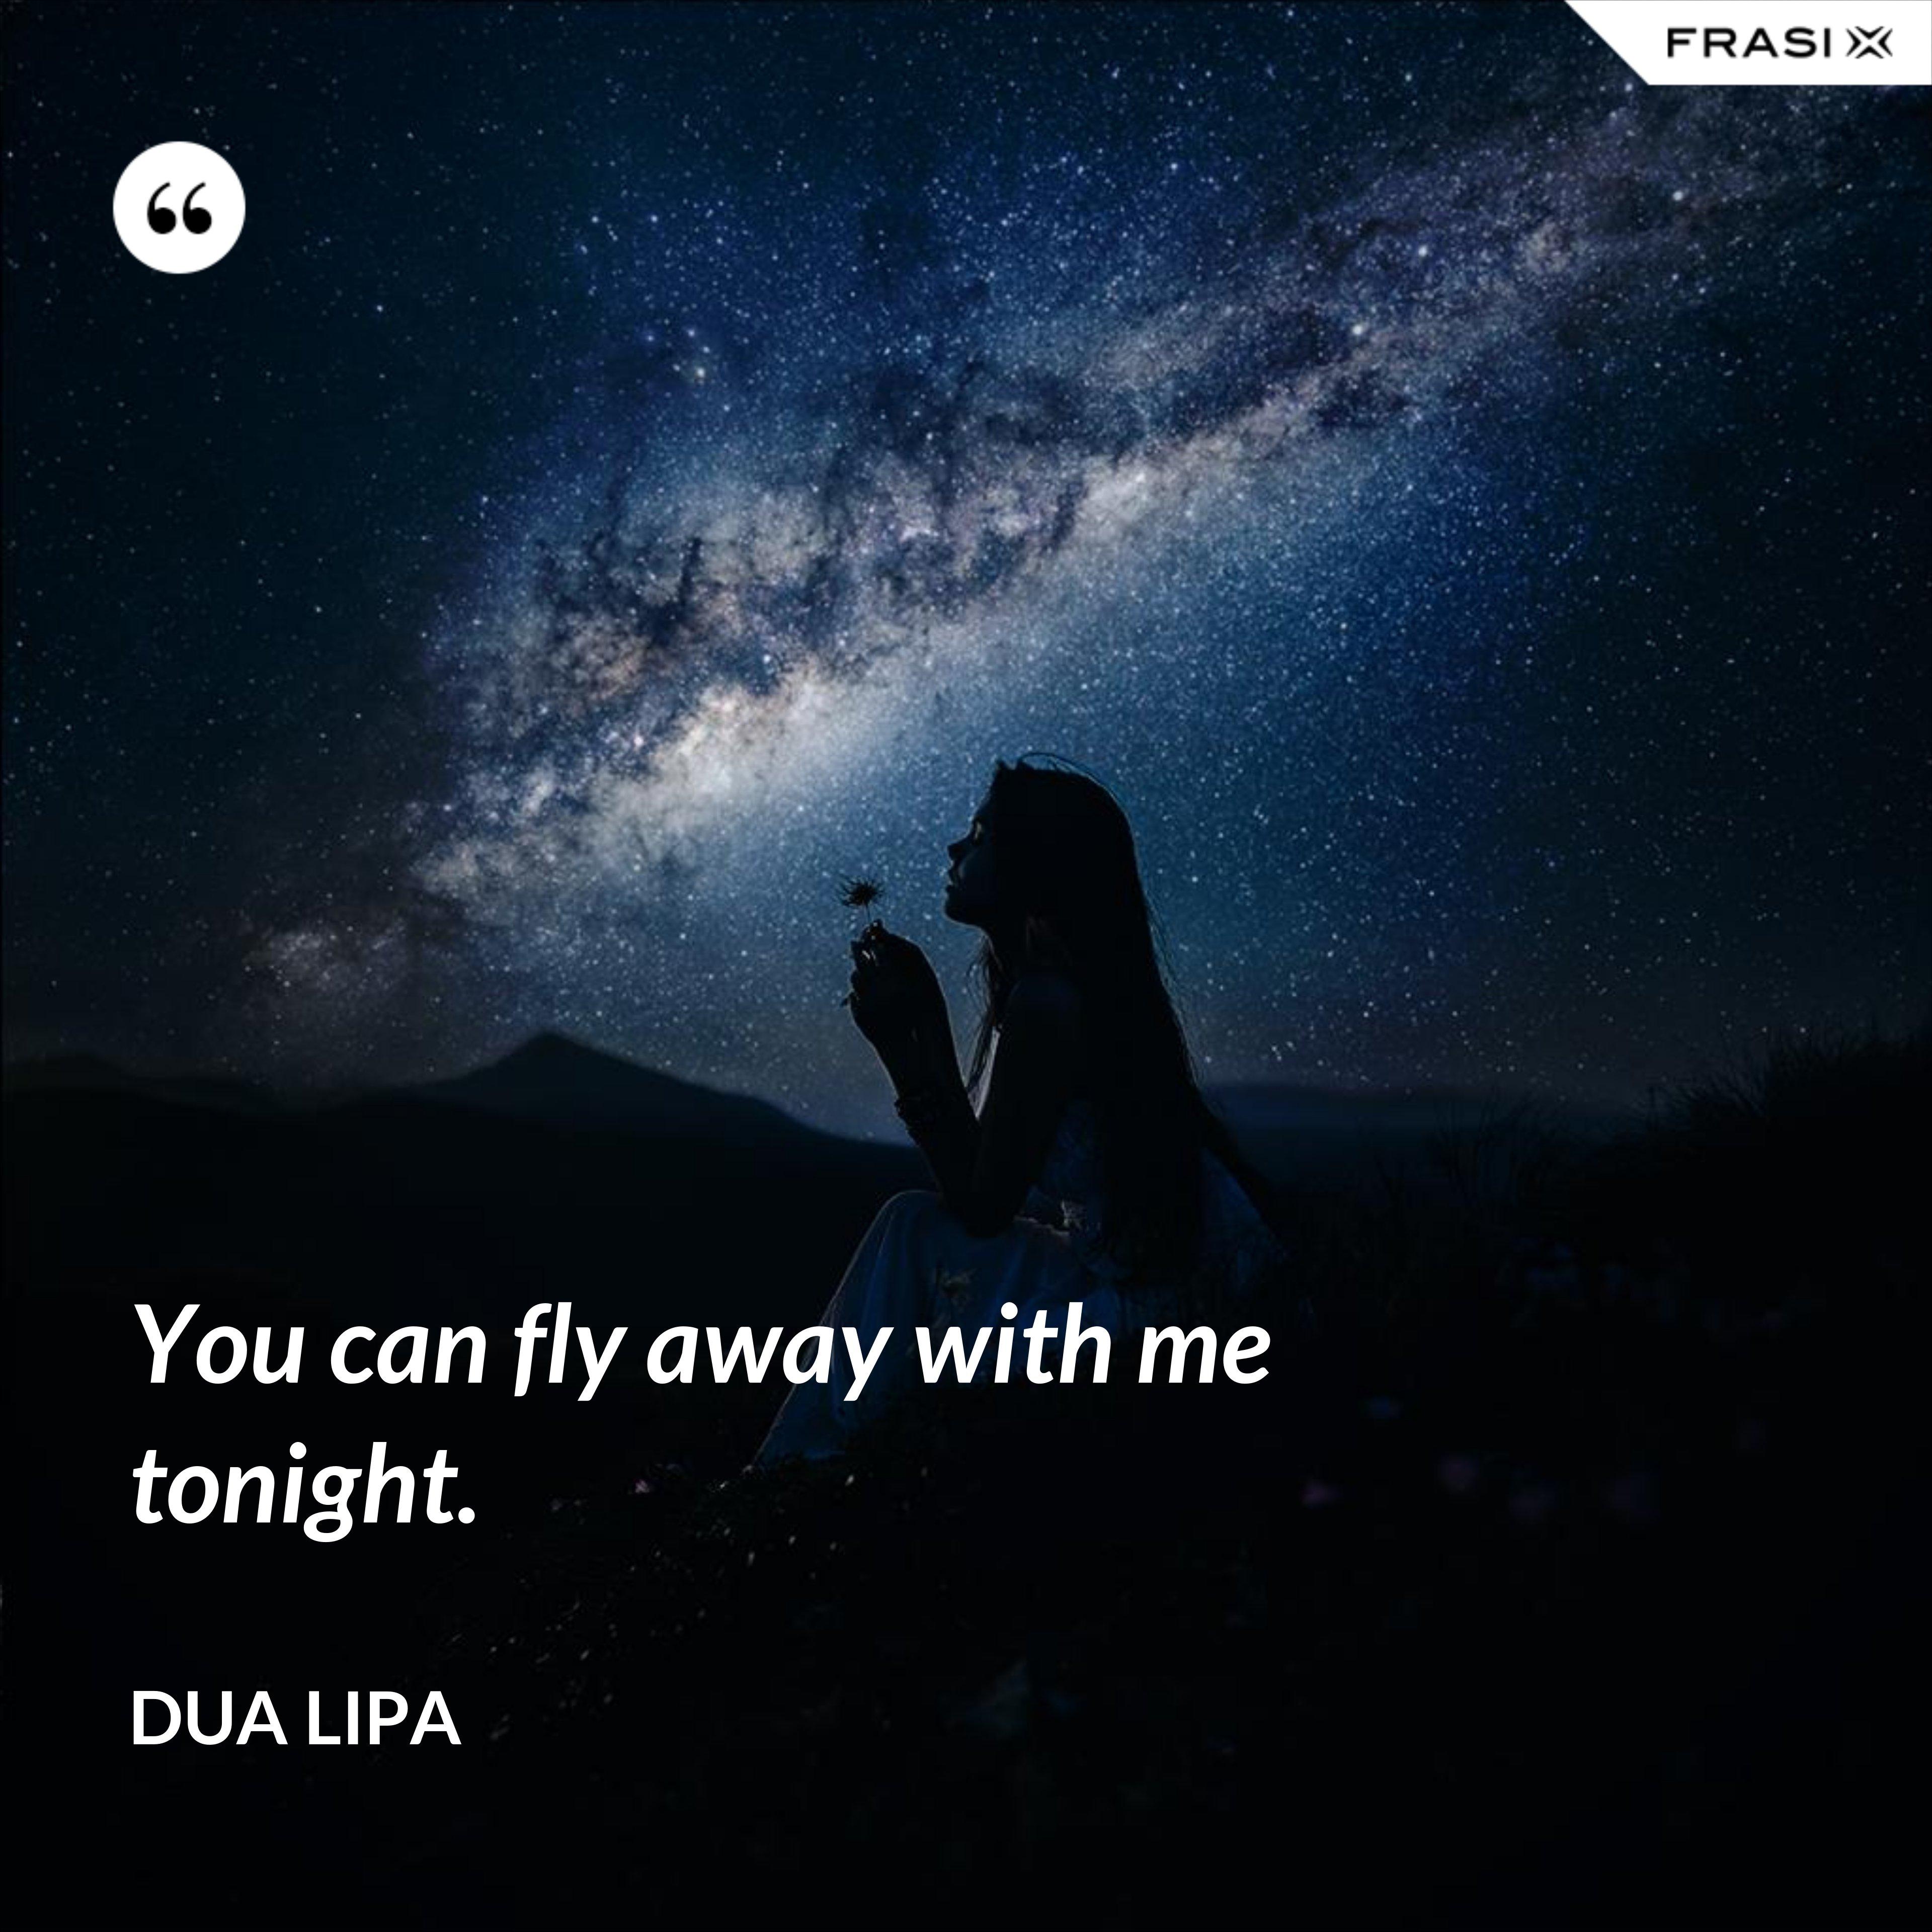 You can fly away with me tonight. - Dua Lipa